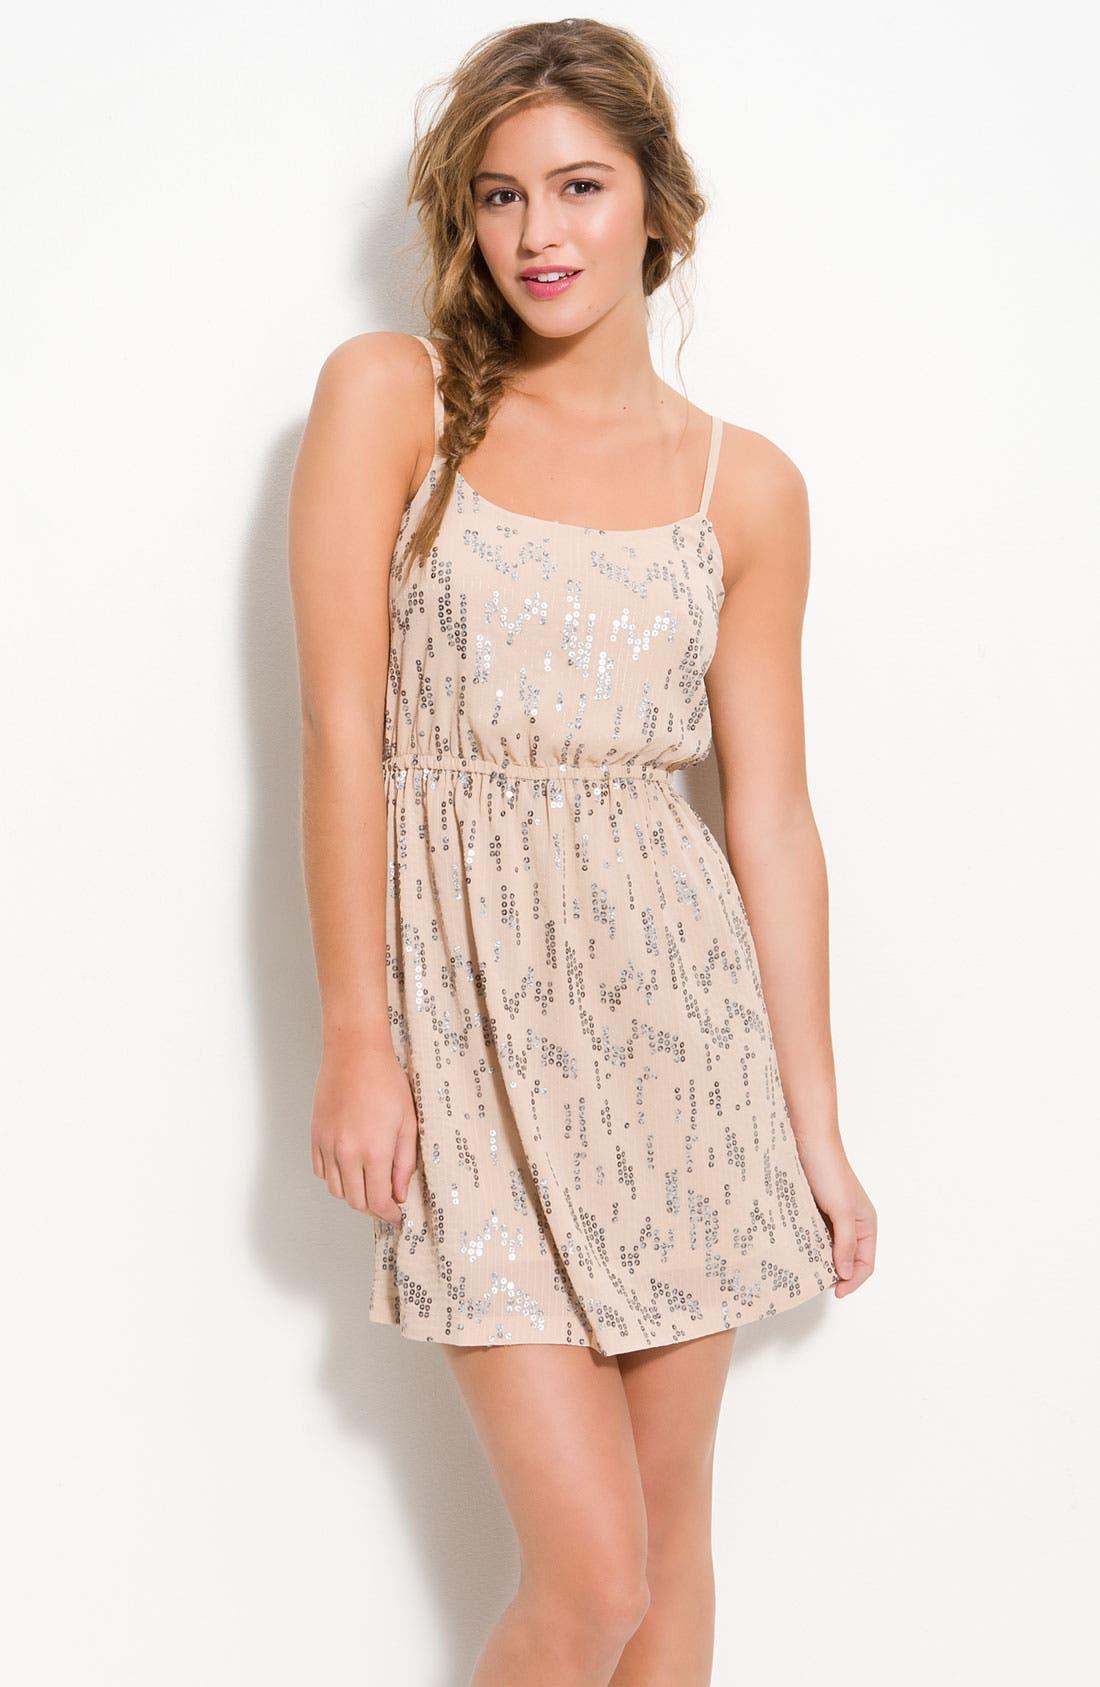 Alternate Image 1 Selected - Lush Spaced Sequins Blouson Dress (Juniors)